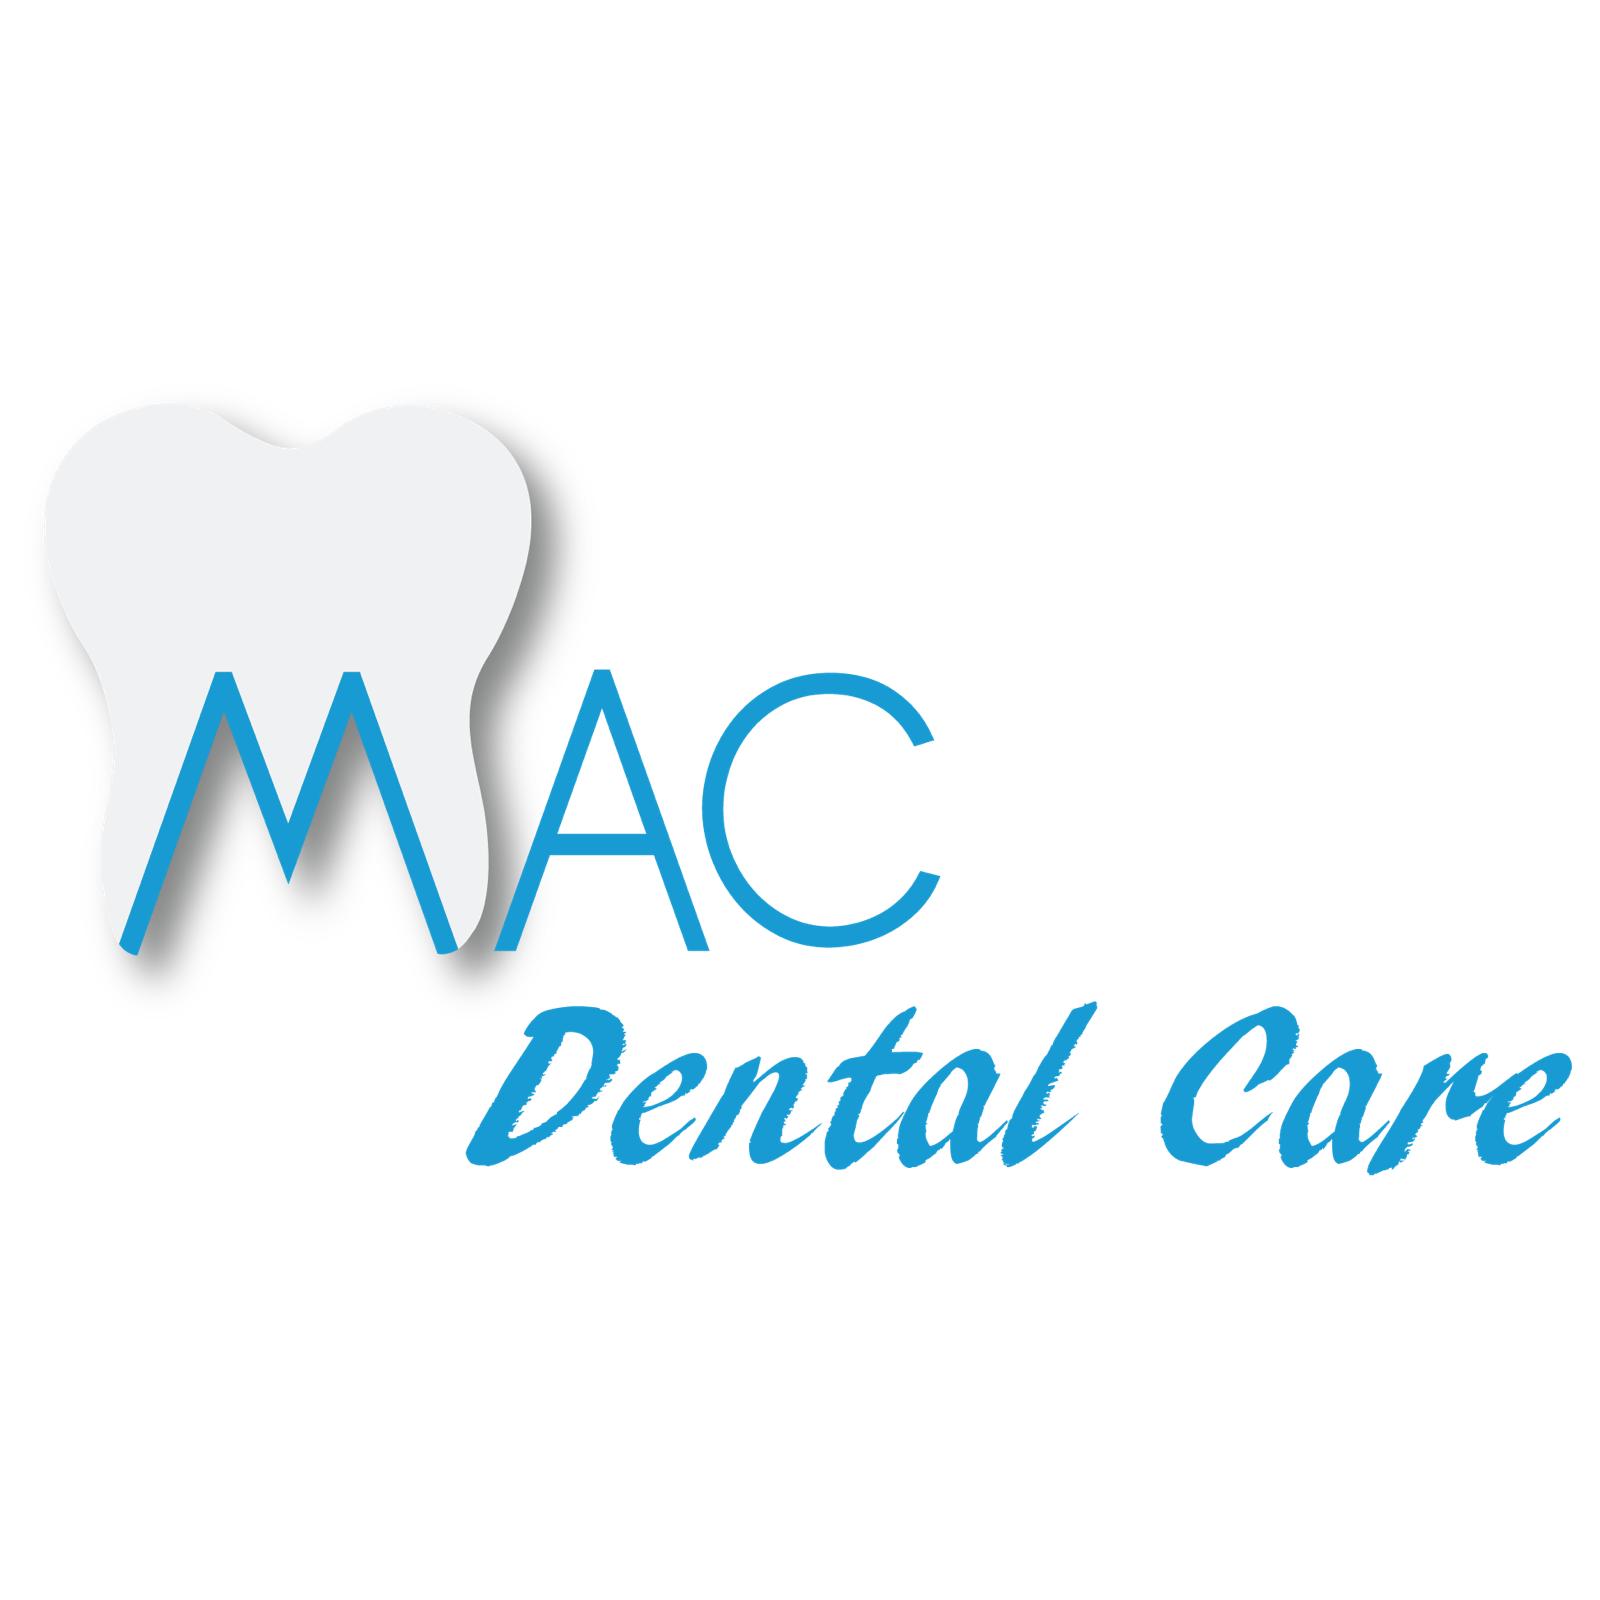 MAC Dental Care - Miami, FL - Dentists & Dental Services